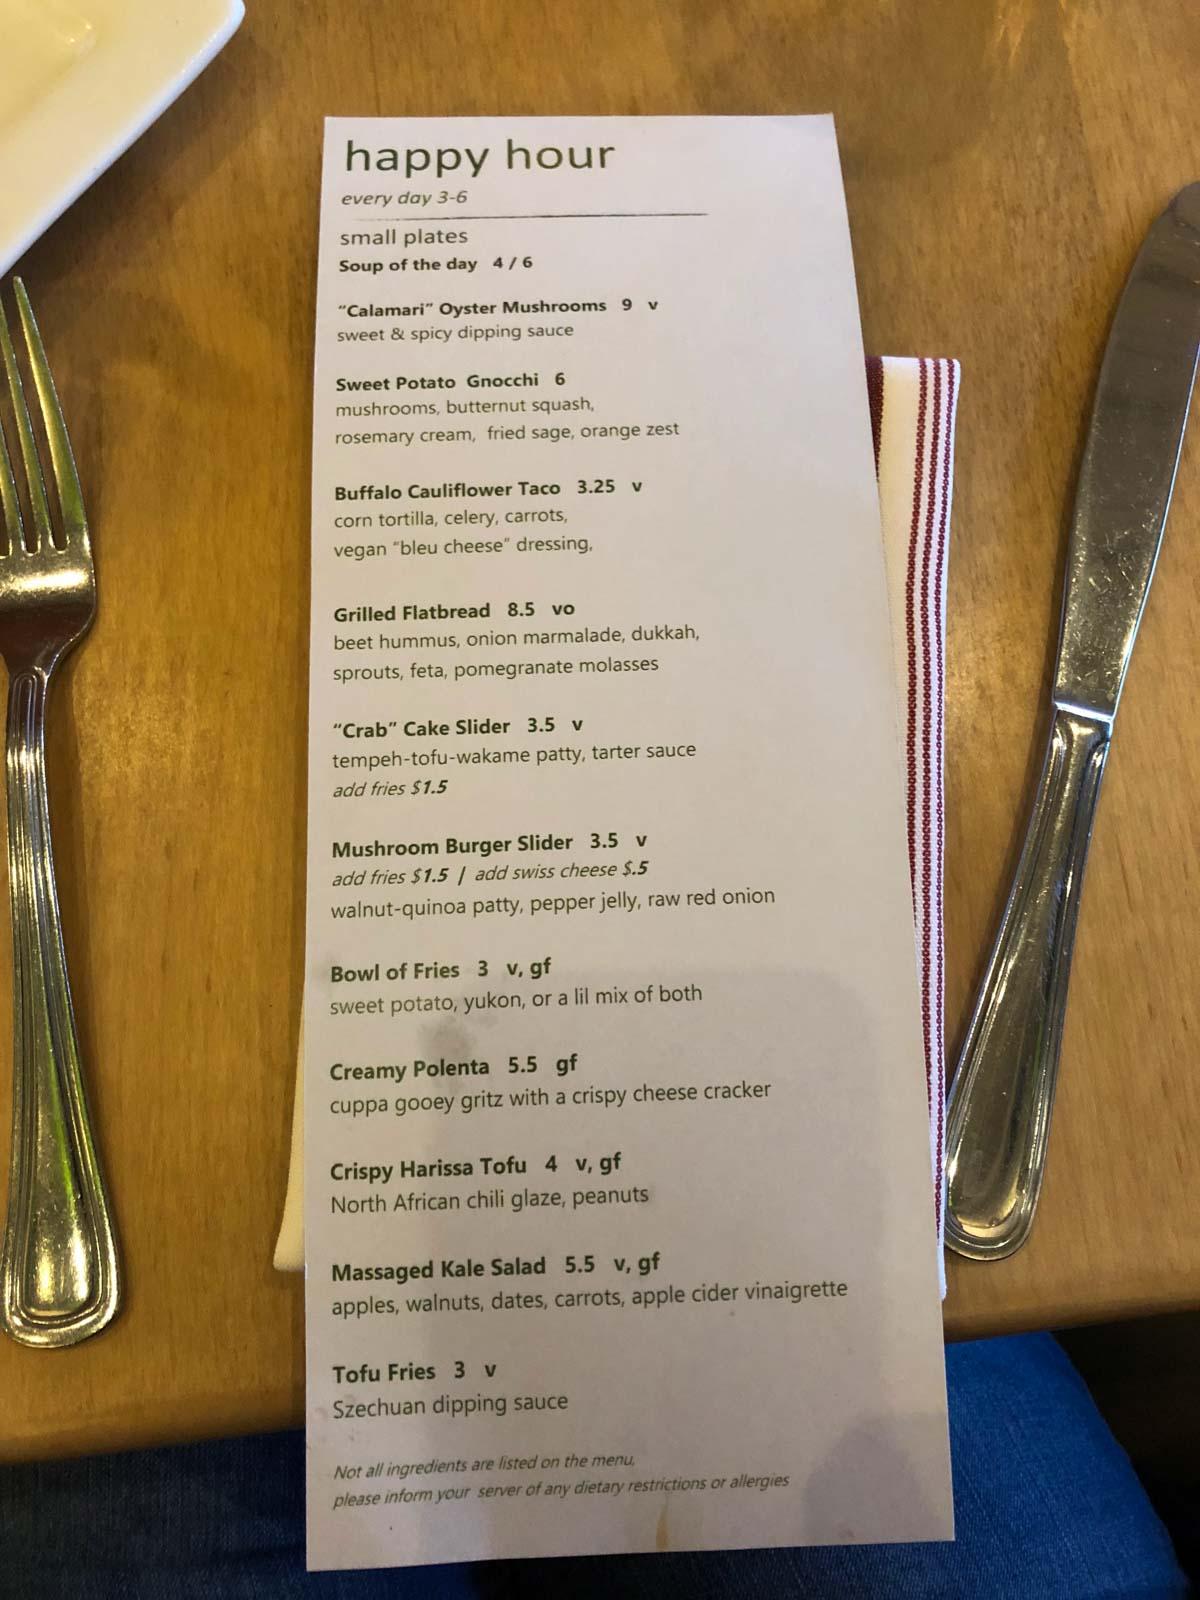 Leaf vegetarian restaurant Boulder Colorado happy hour menu